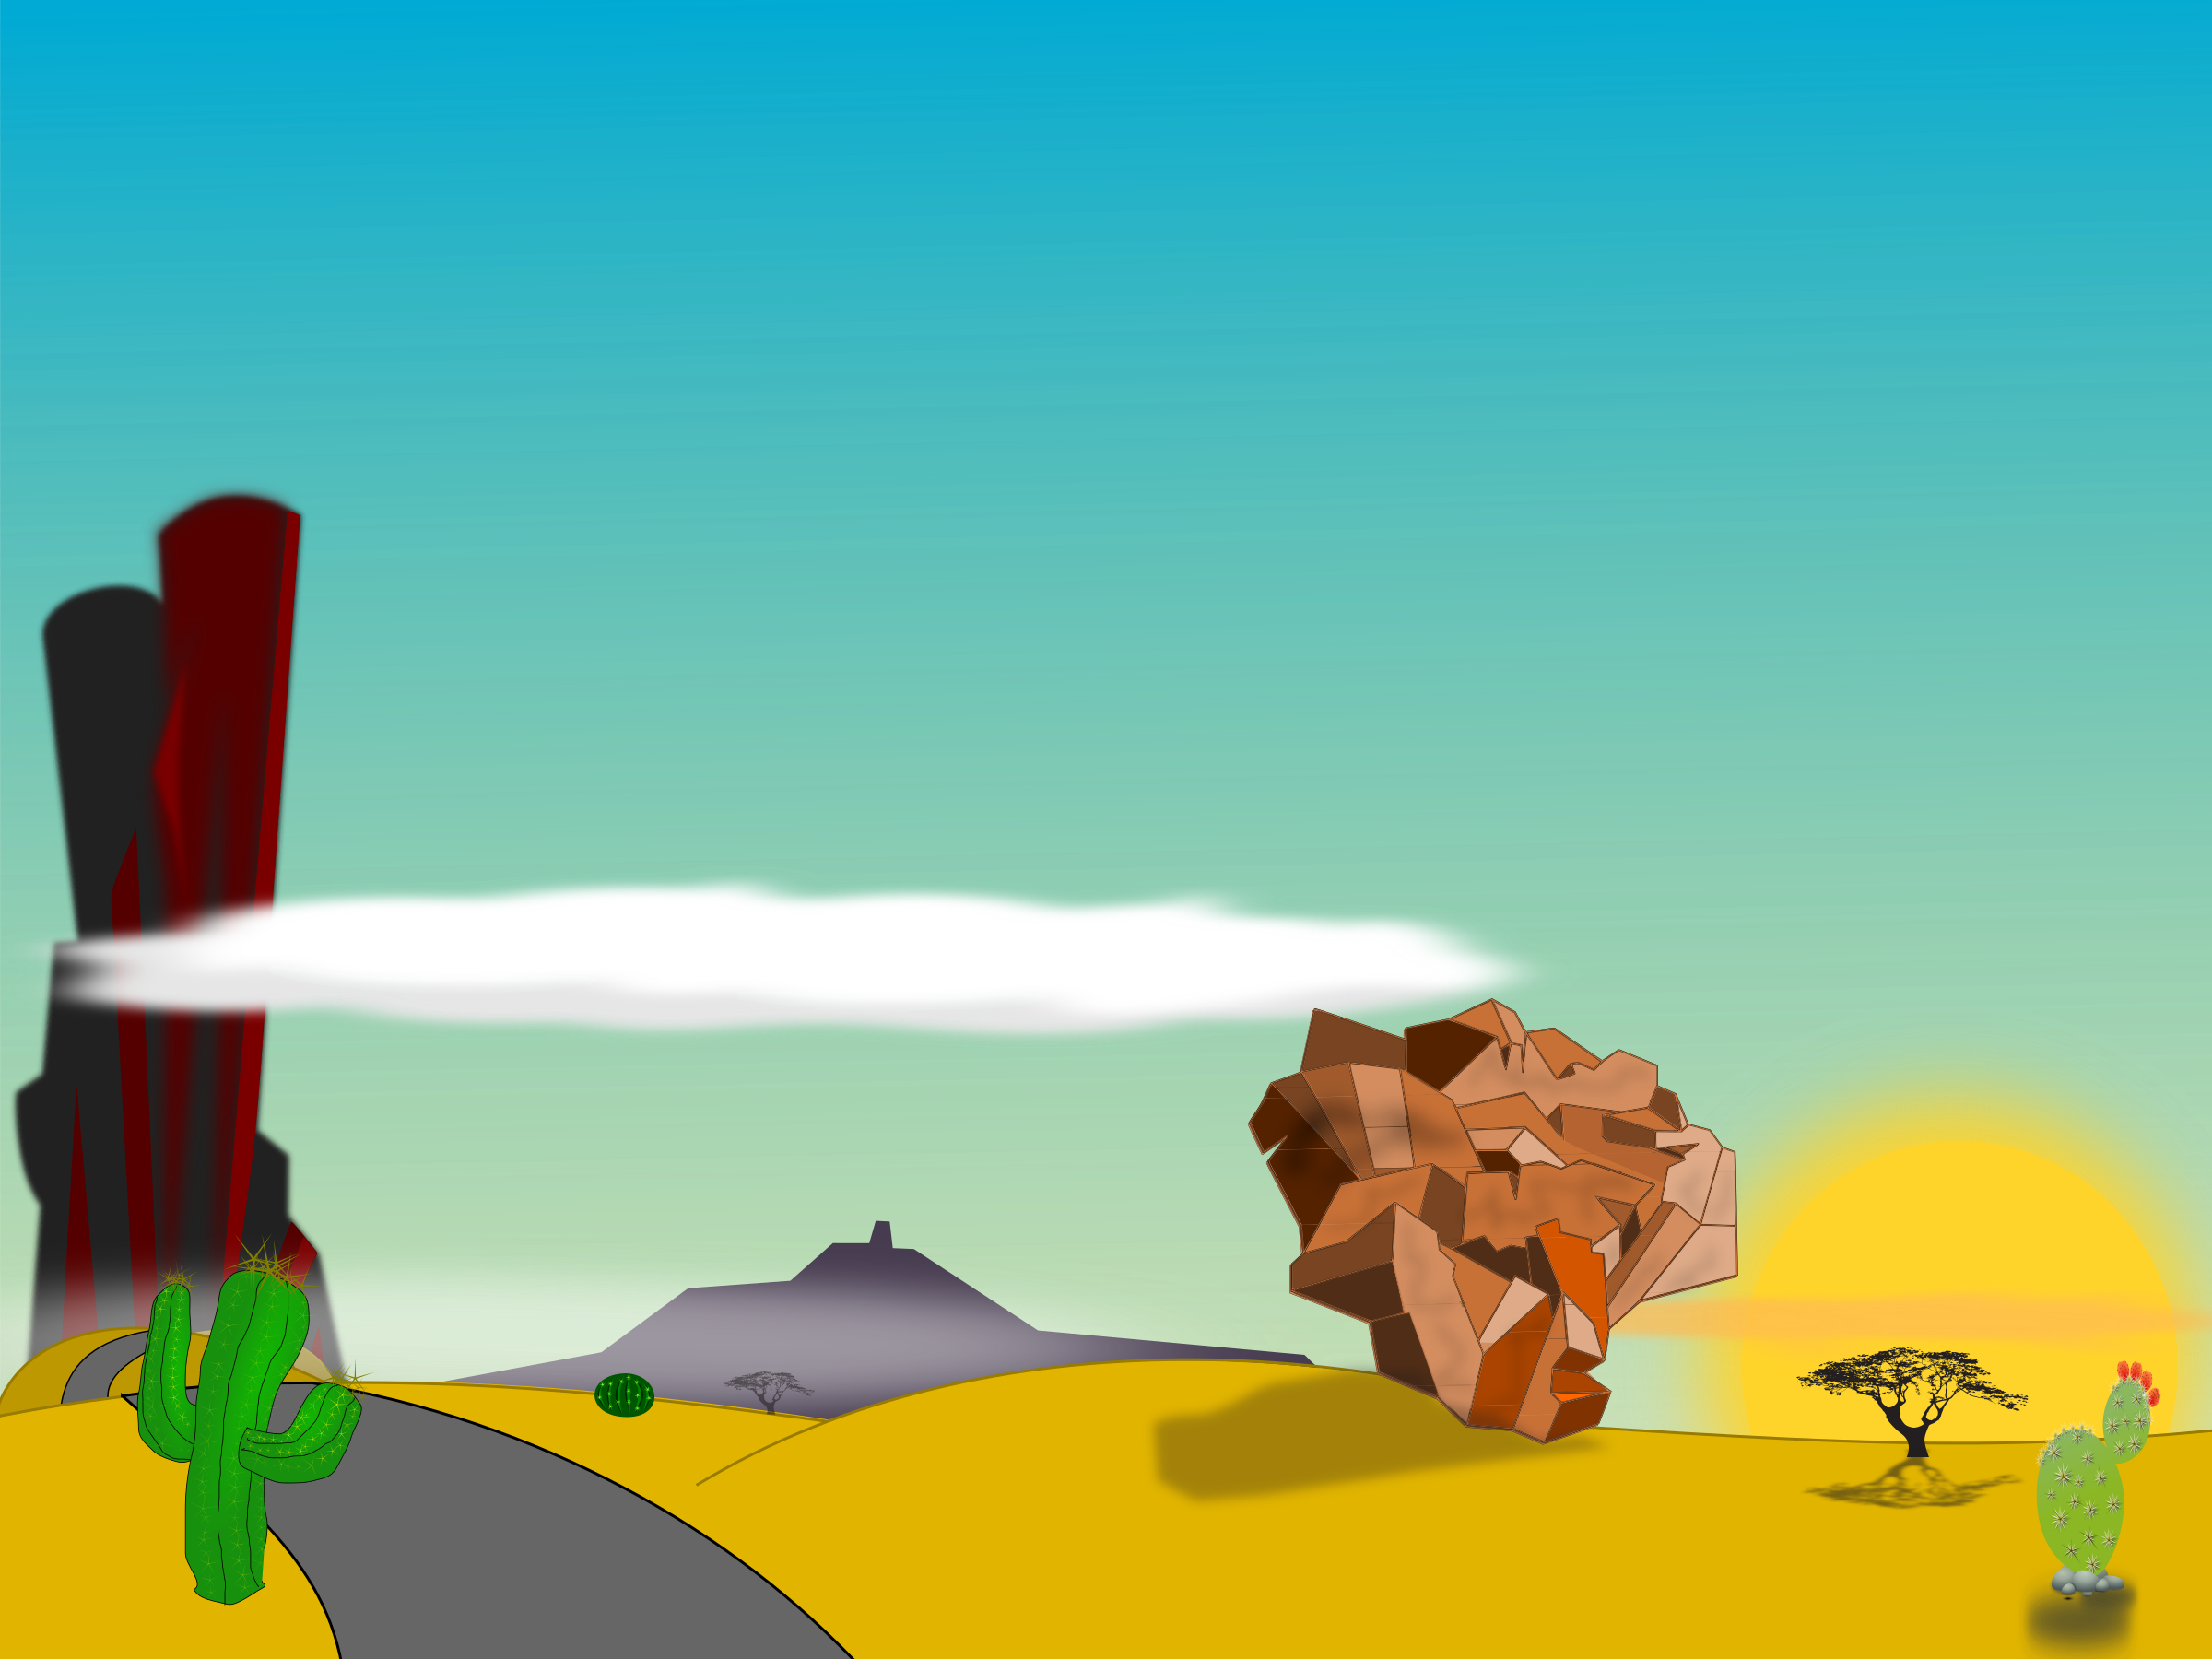 graphic  collection of desert. Vector artist landscape